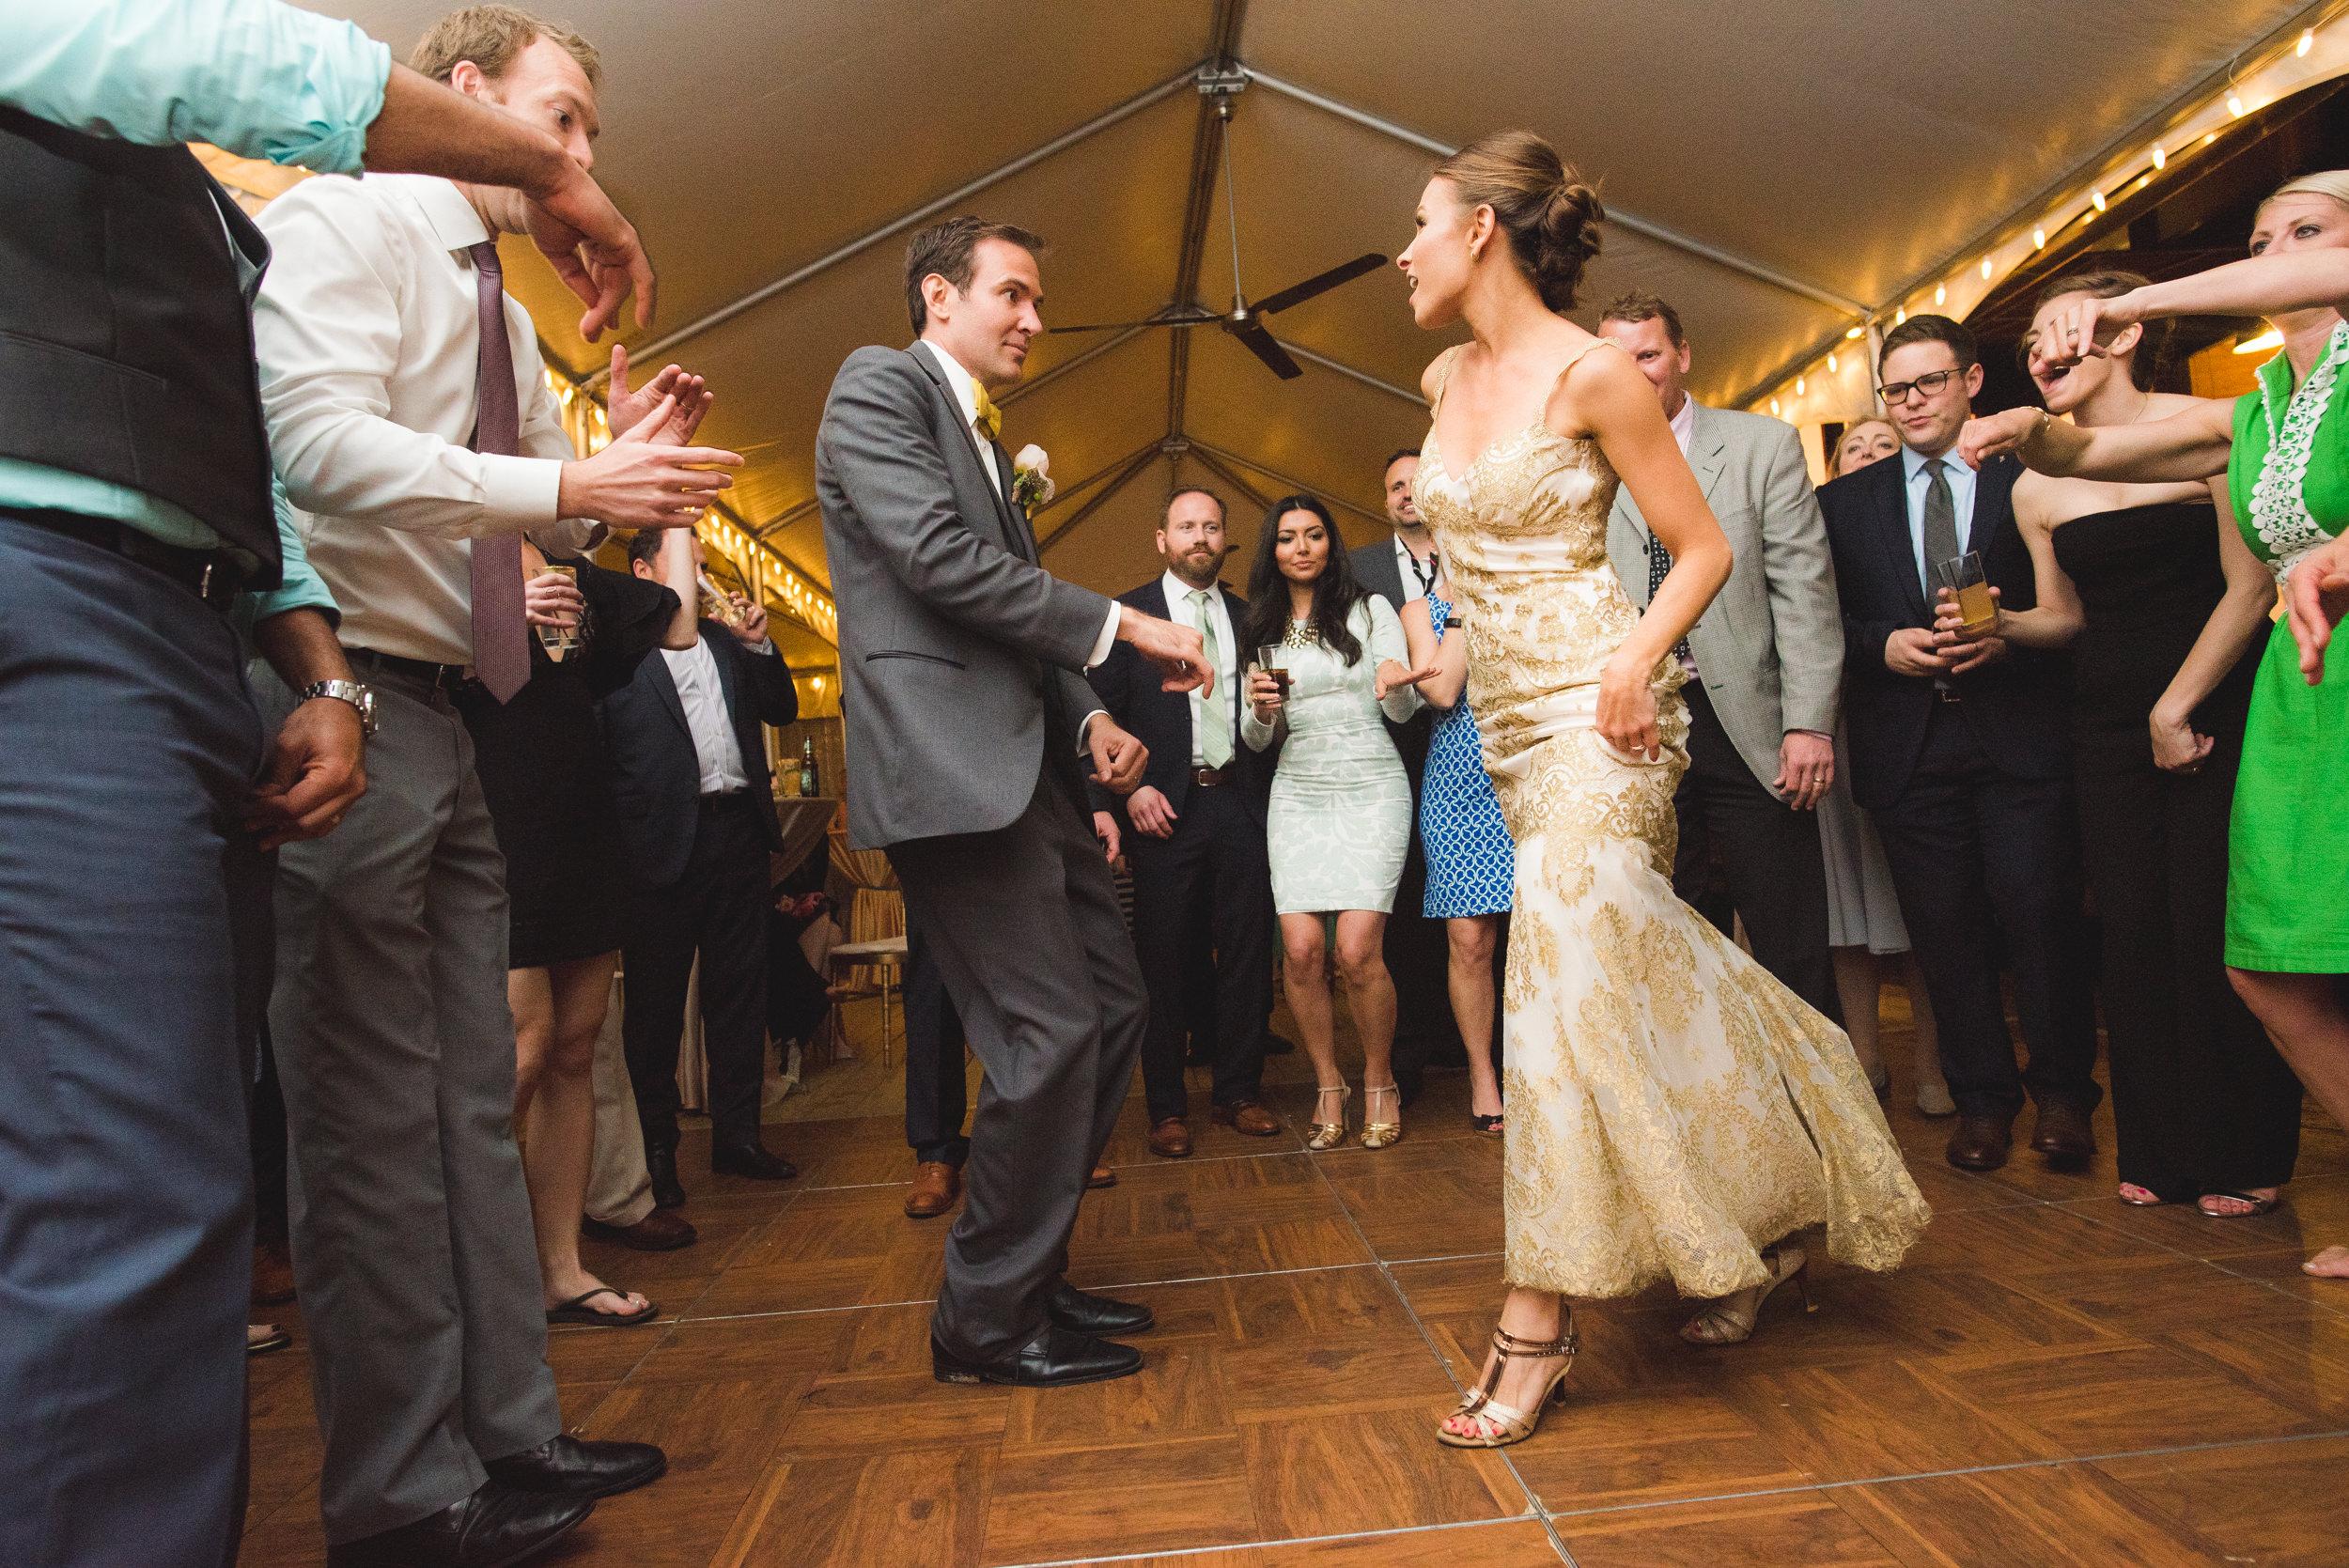 Philip Merrill Environmental Center wedding-33.jpg